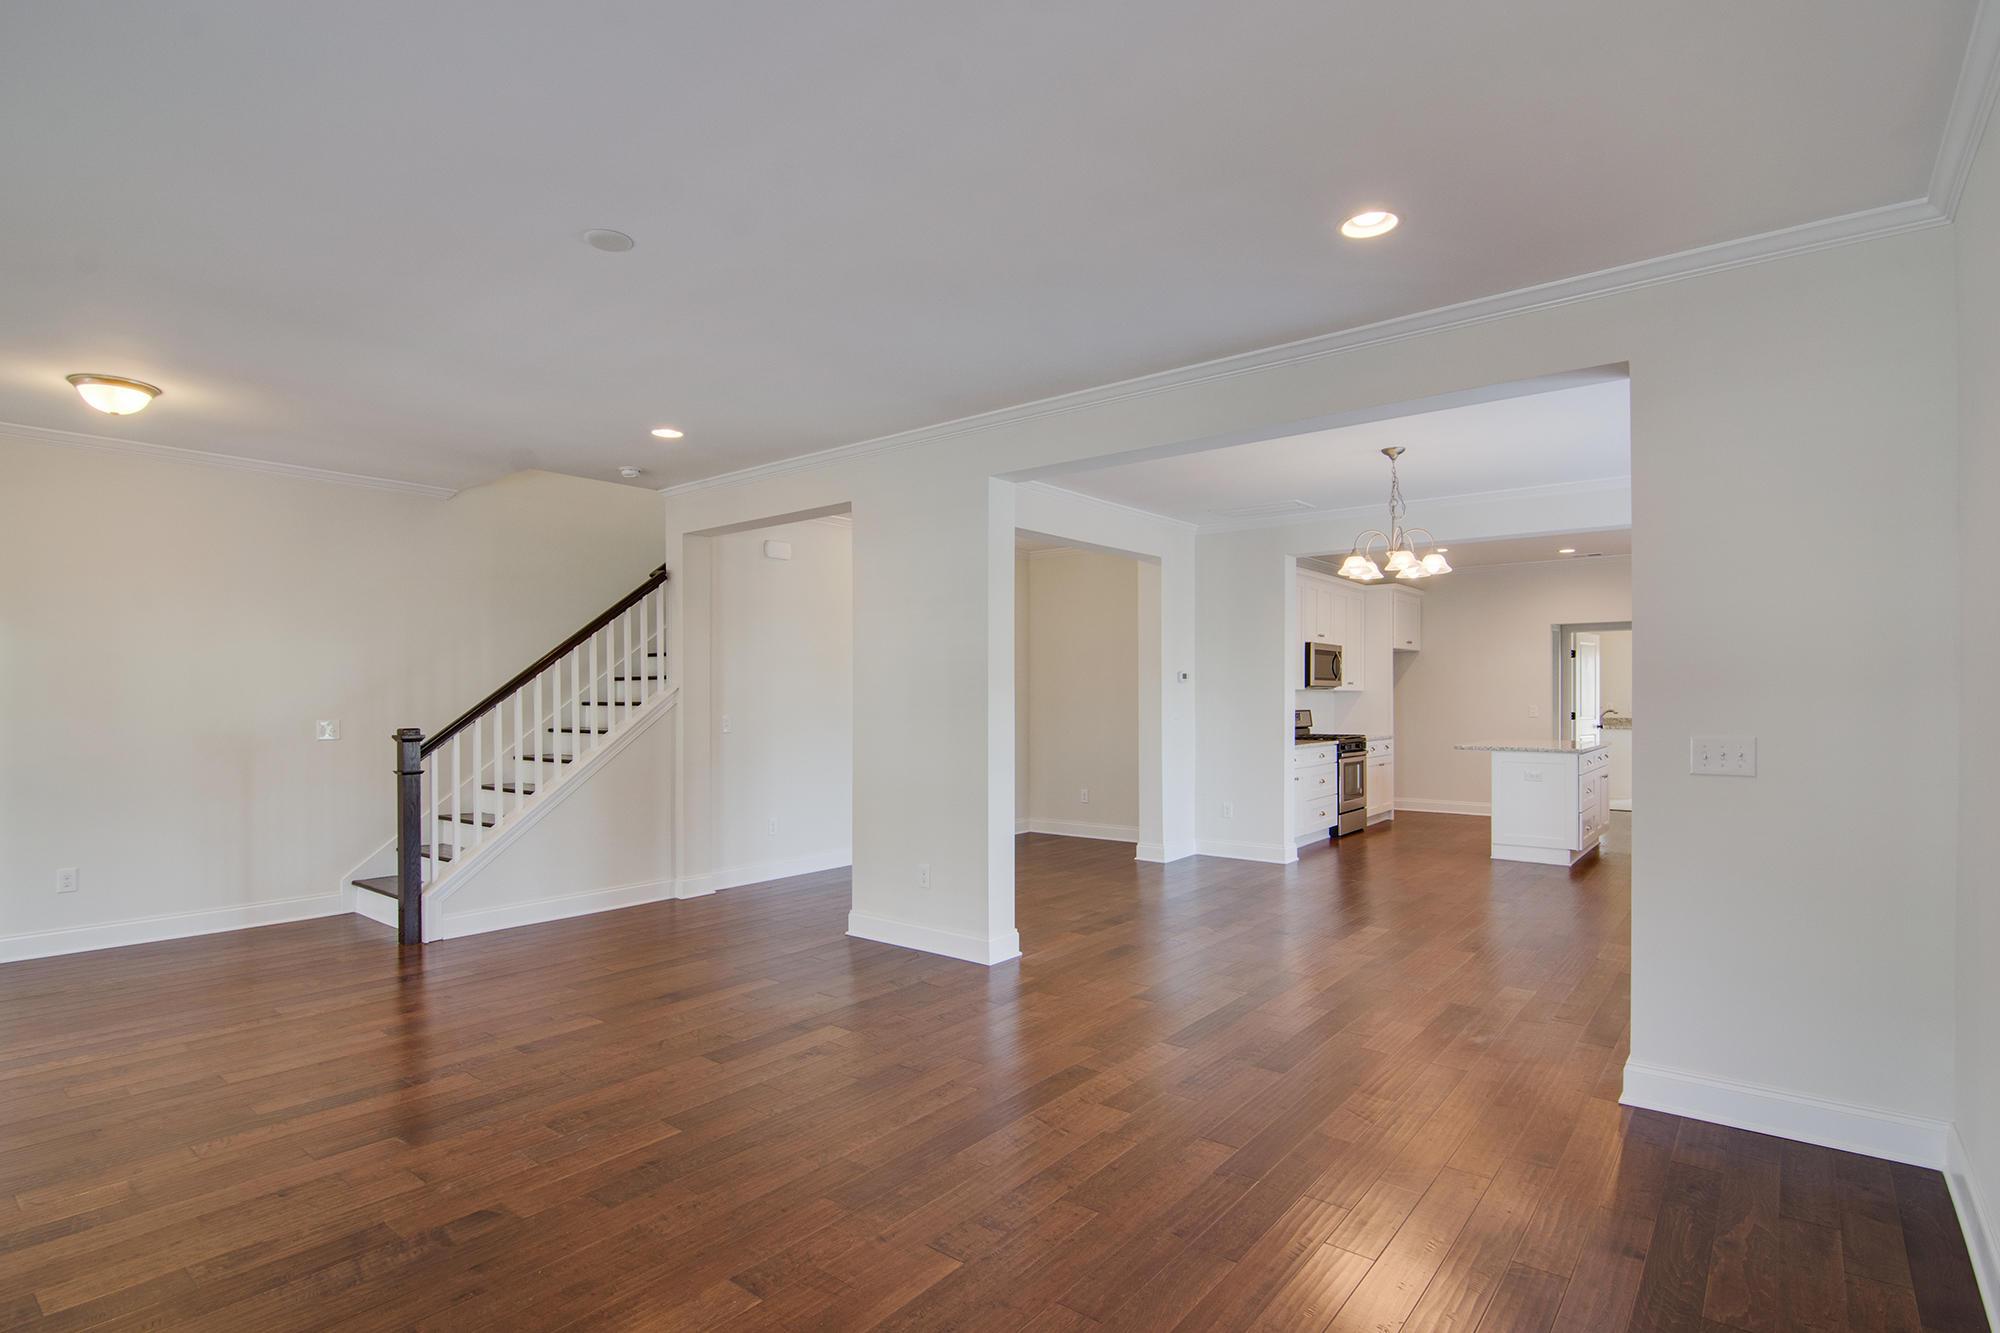 Home for sale 1693 Sparkleberry Lane, Whitney Lake, Johns Island, SC